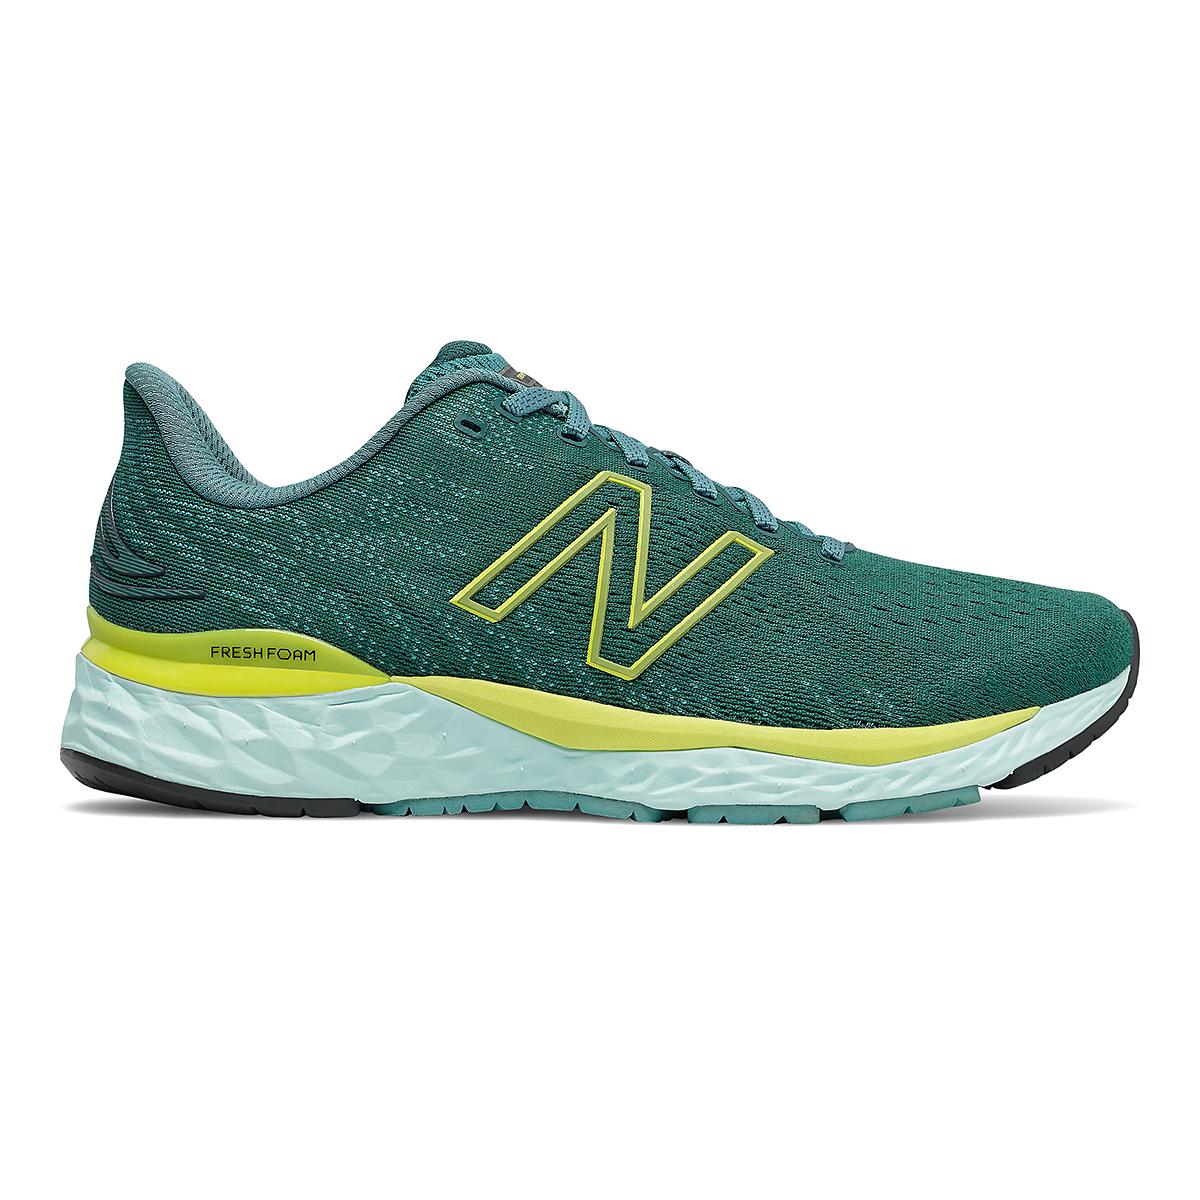 Men's New Balance Fresh Foam 880v11 Running Shoe - Color: Trek/Sulpher Yellow - Size: 7 - Width: Wide, Trek/Sulpher Yellow, large, image 1